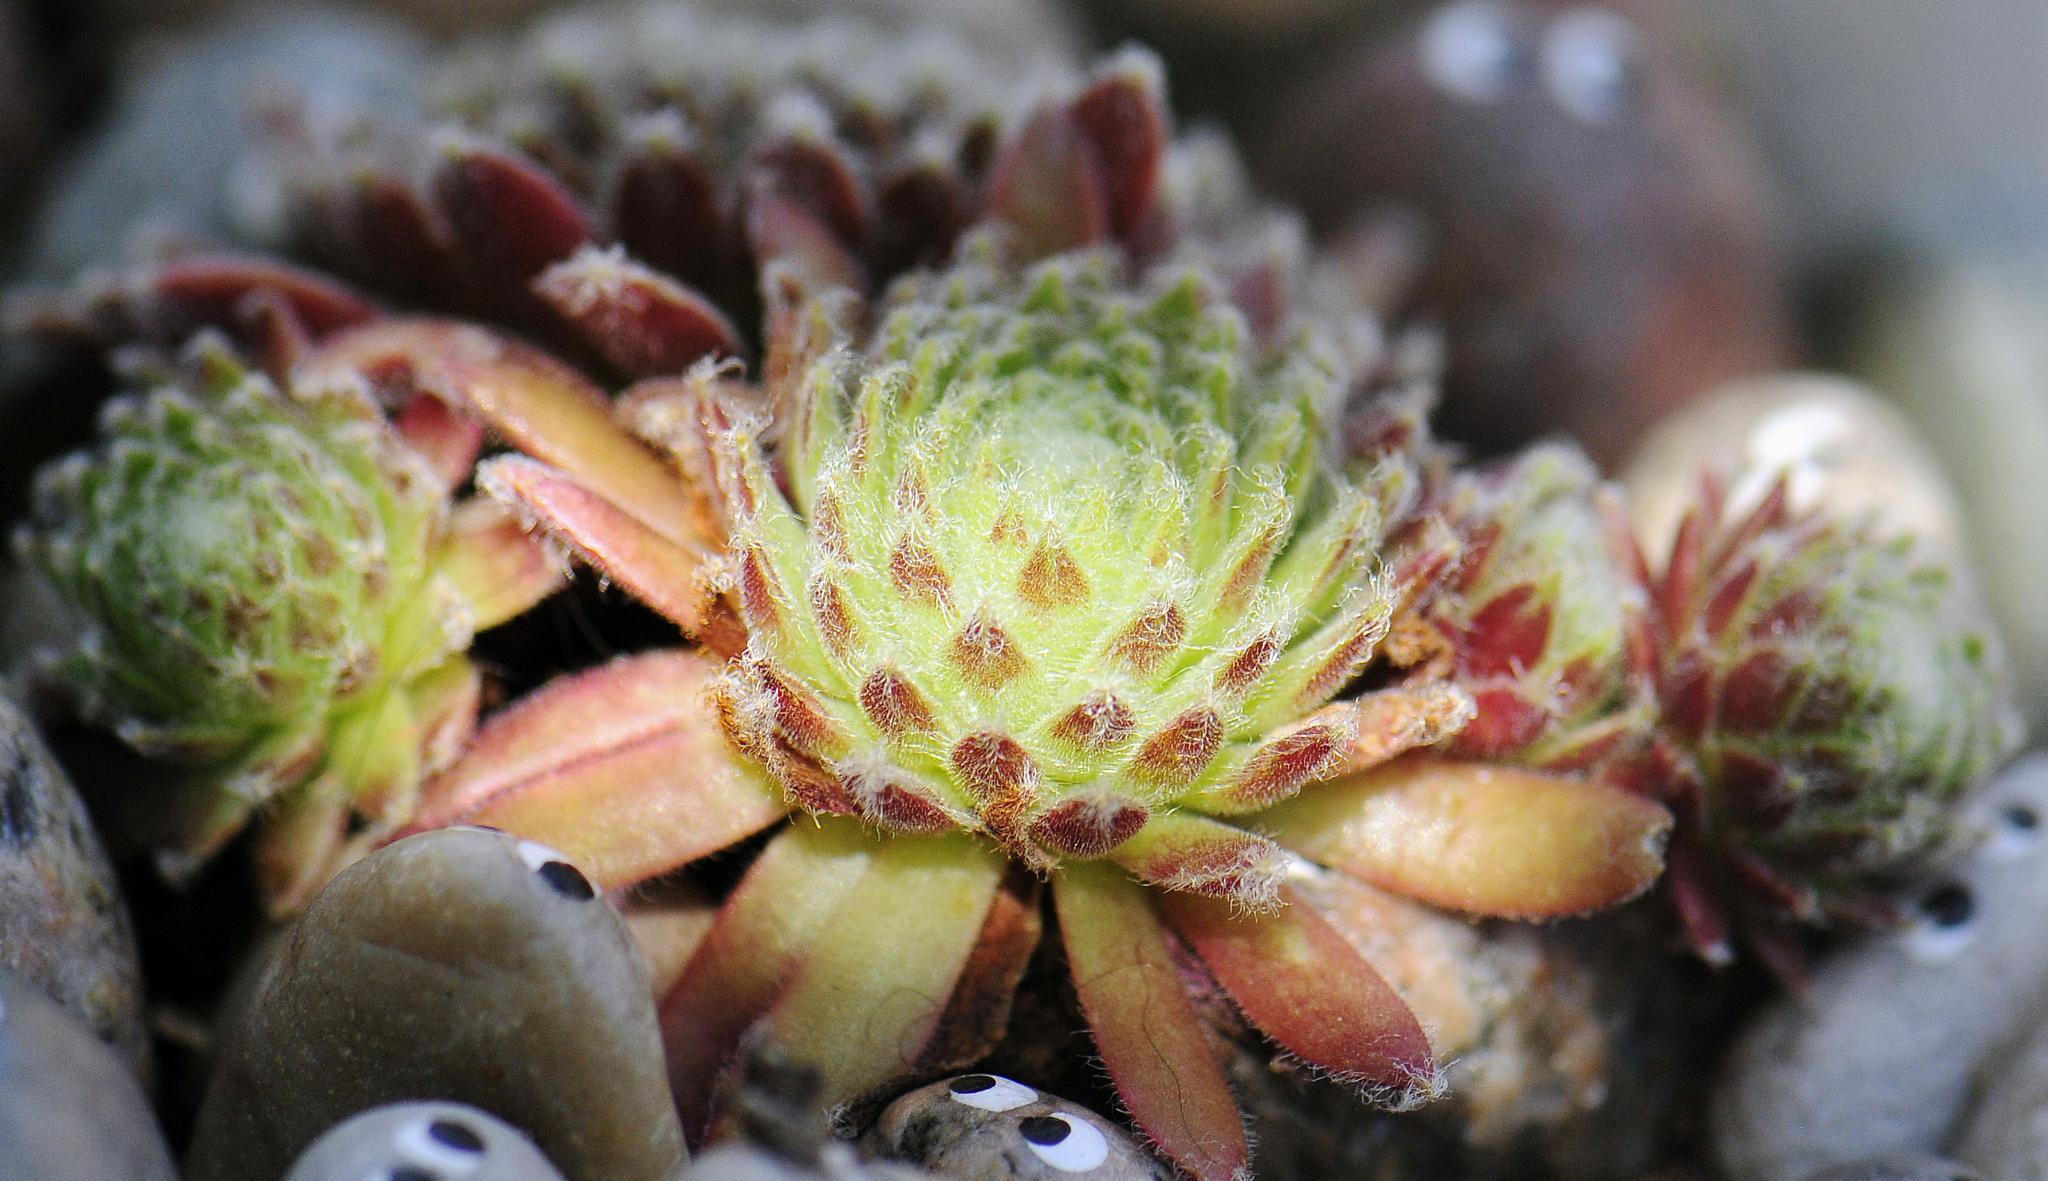 Partially sunlit succulent plant by Mats56